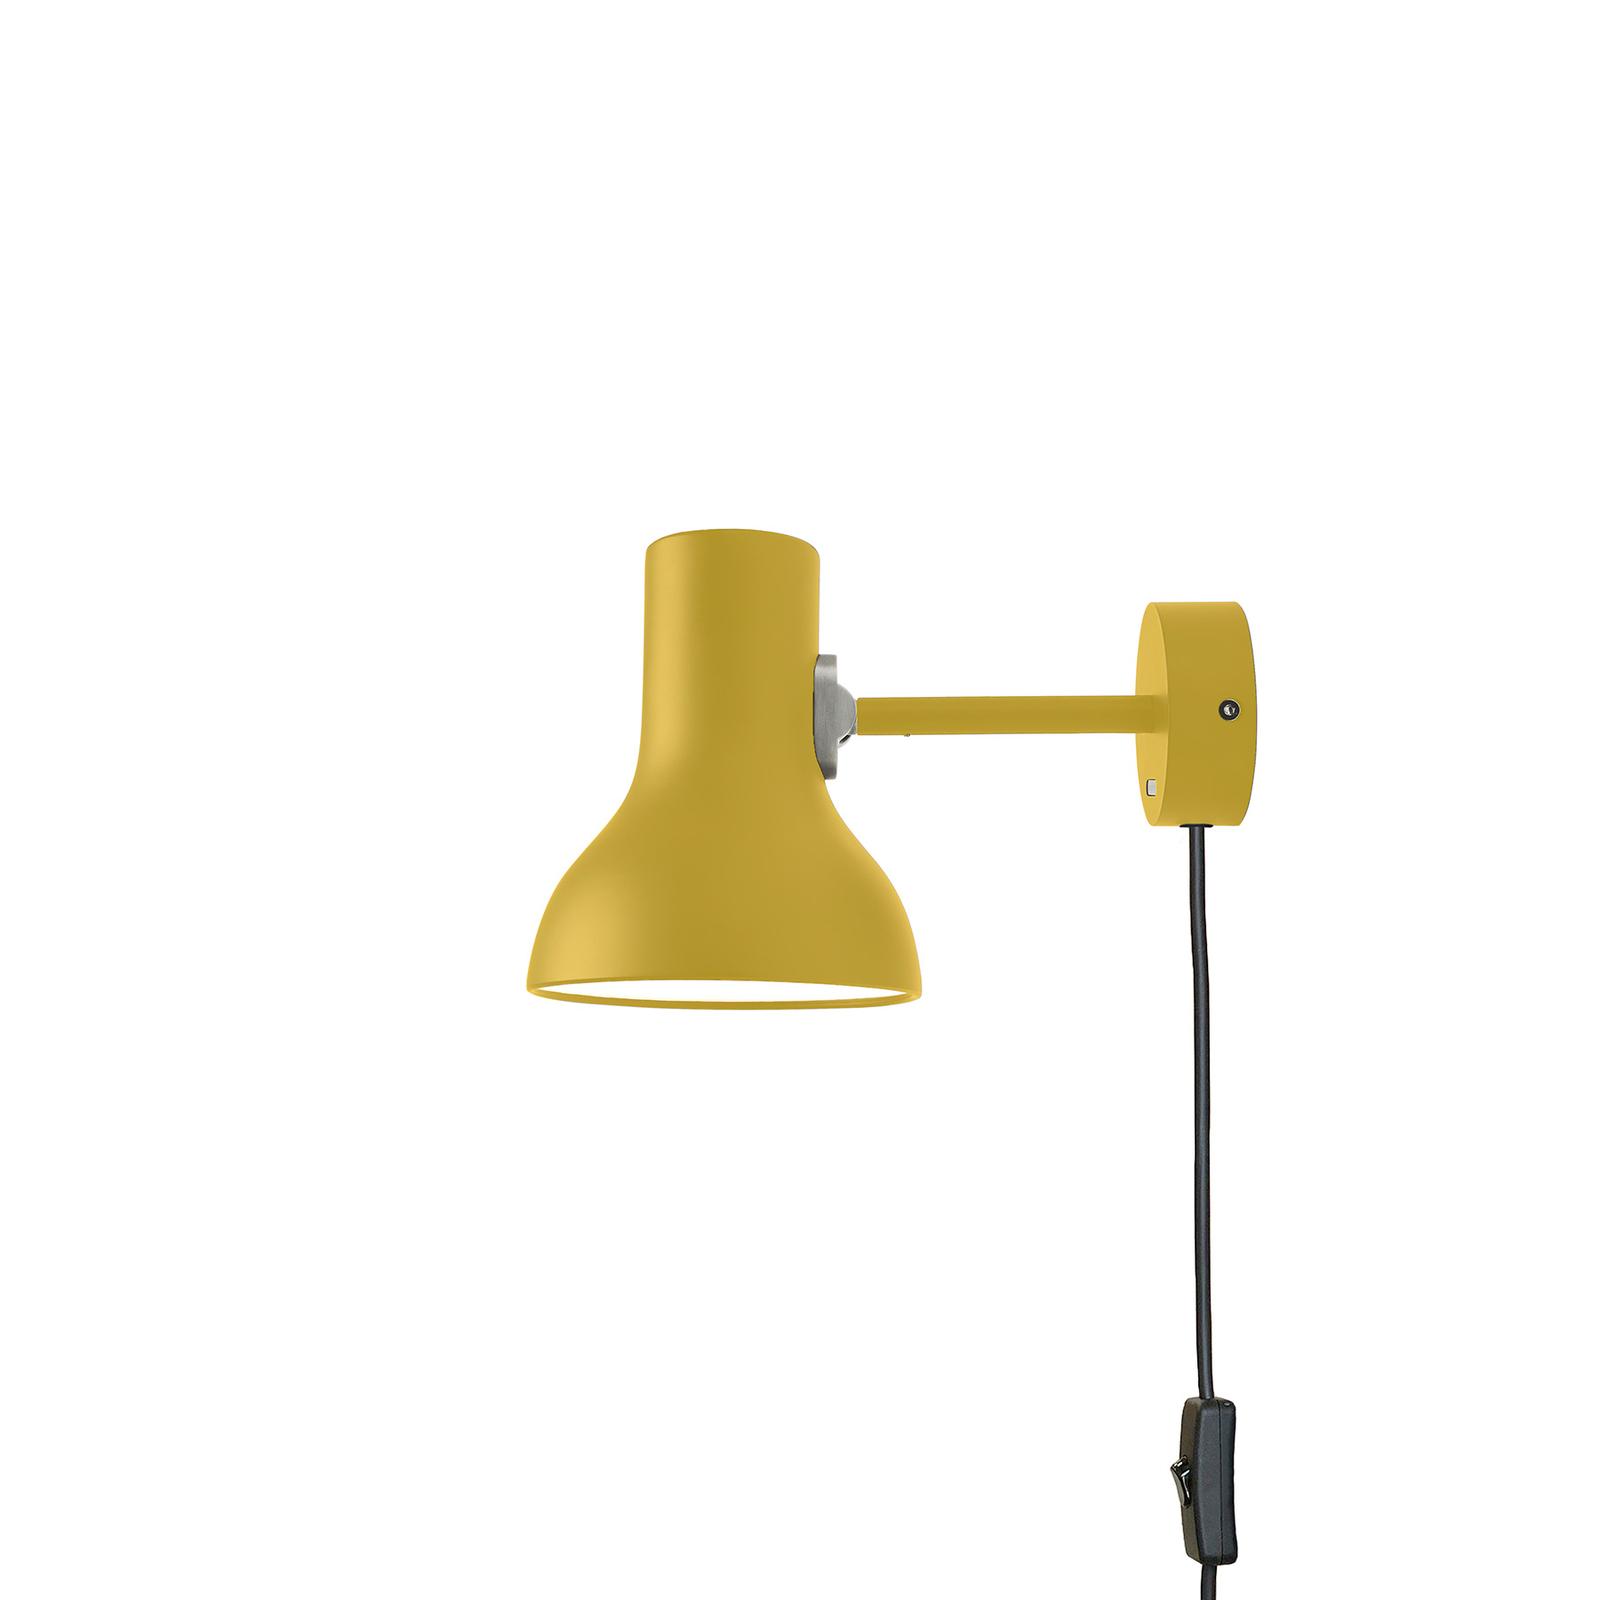 Anglepoise Type 75 Mini applique prise jaune ocre